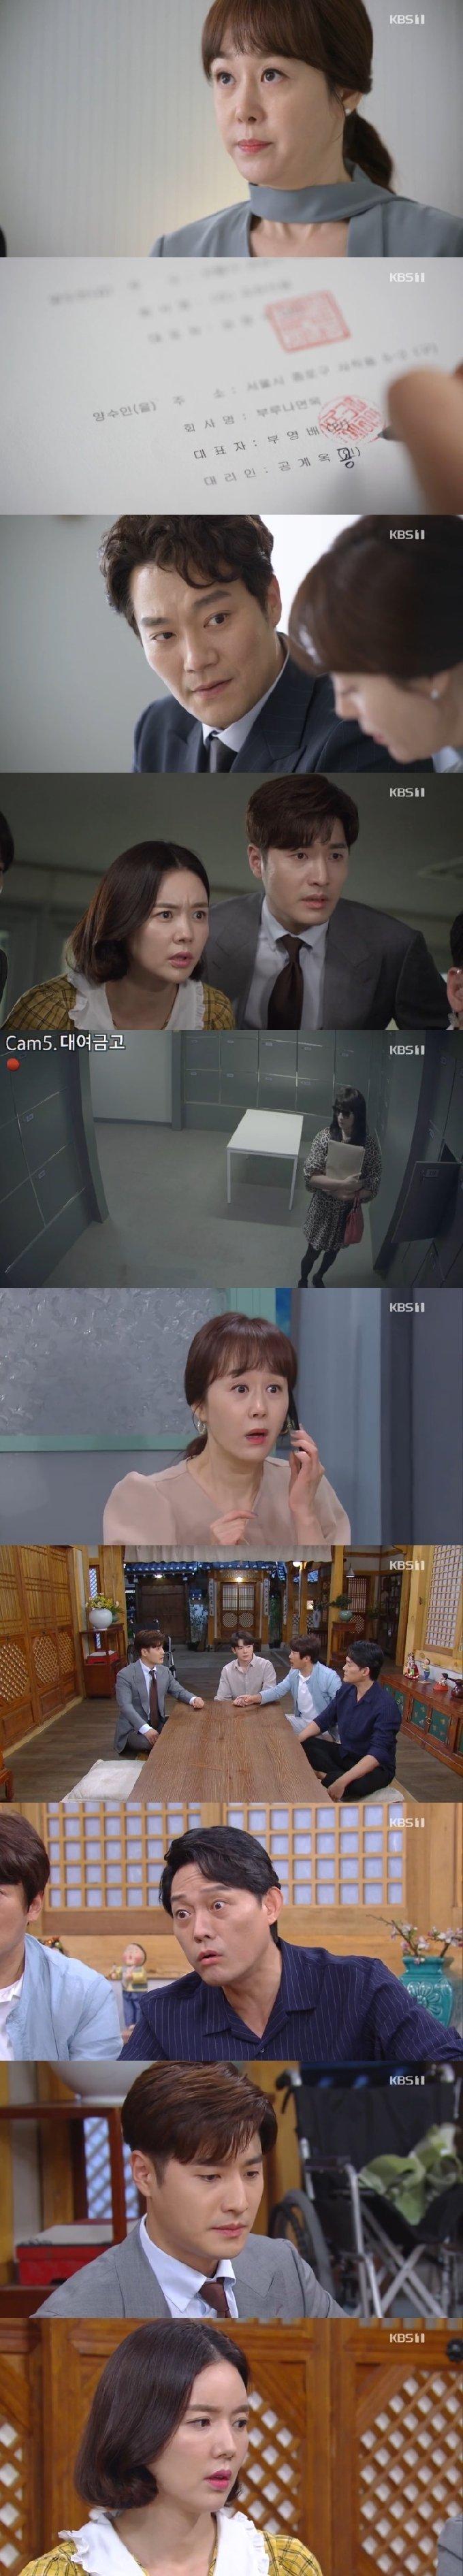 KBS 1TV '기막힌 유산' 캡처 © 뉴스1